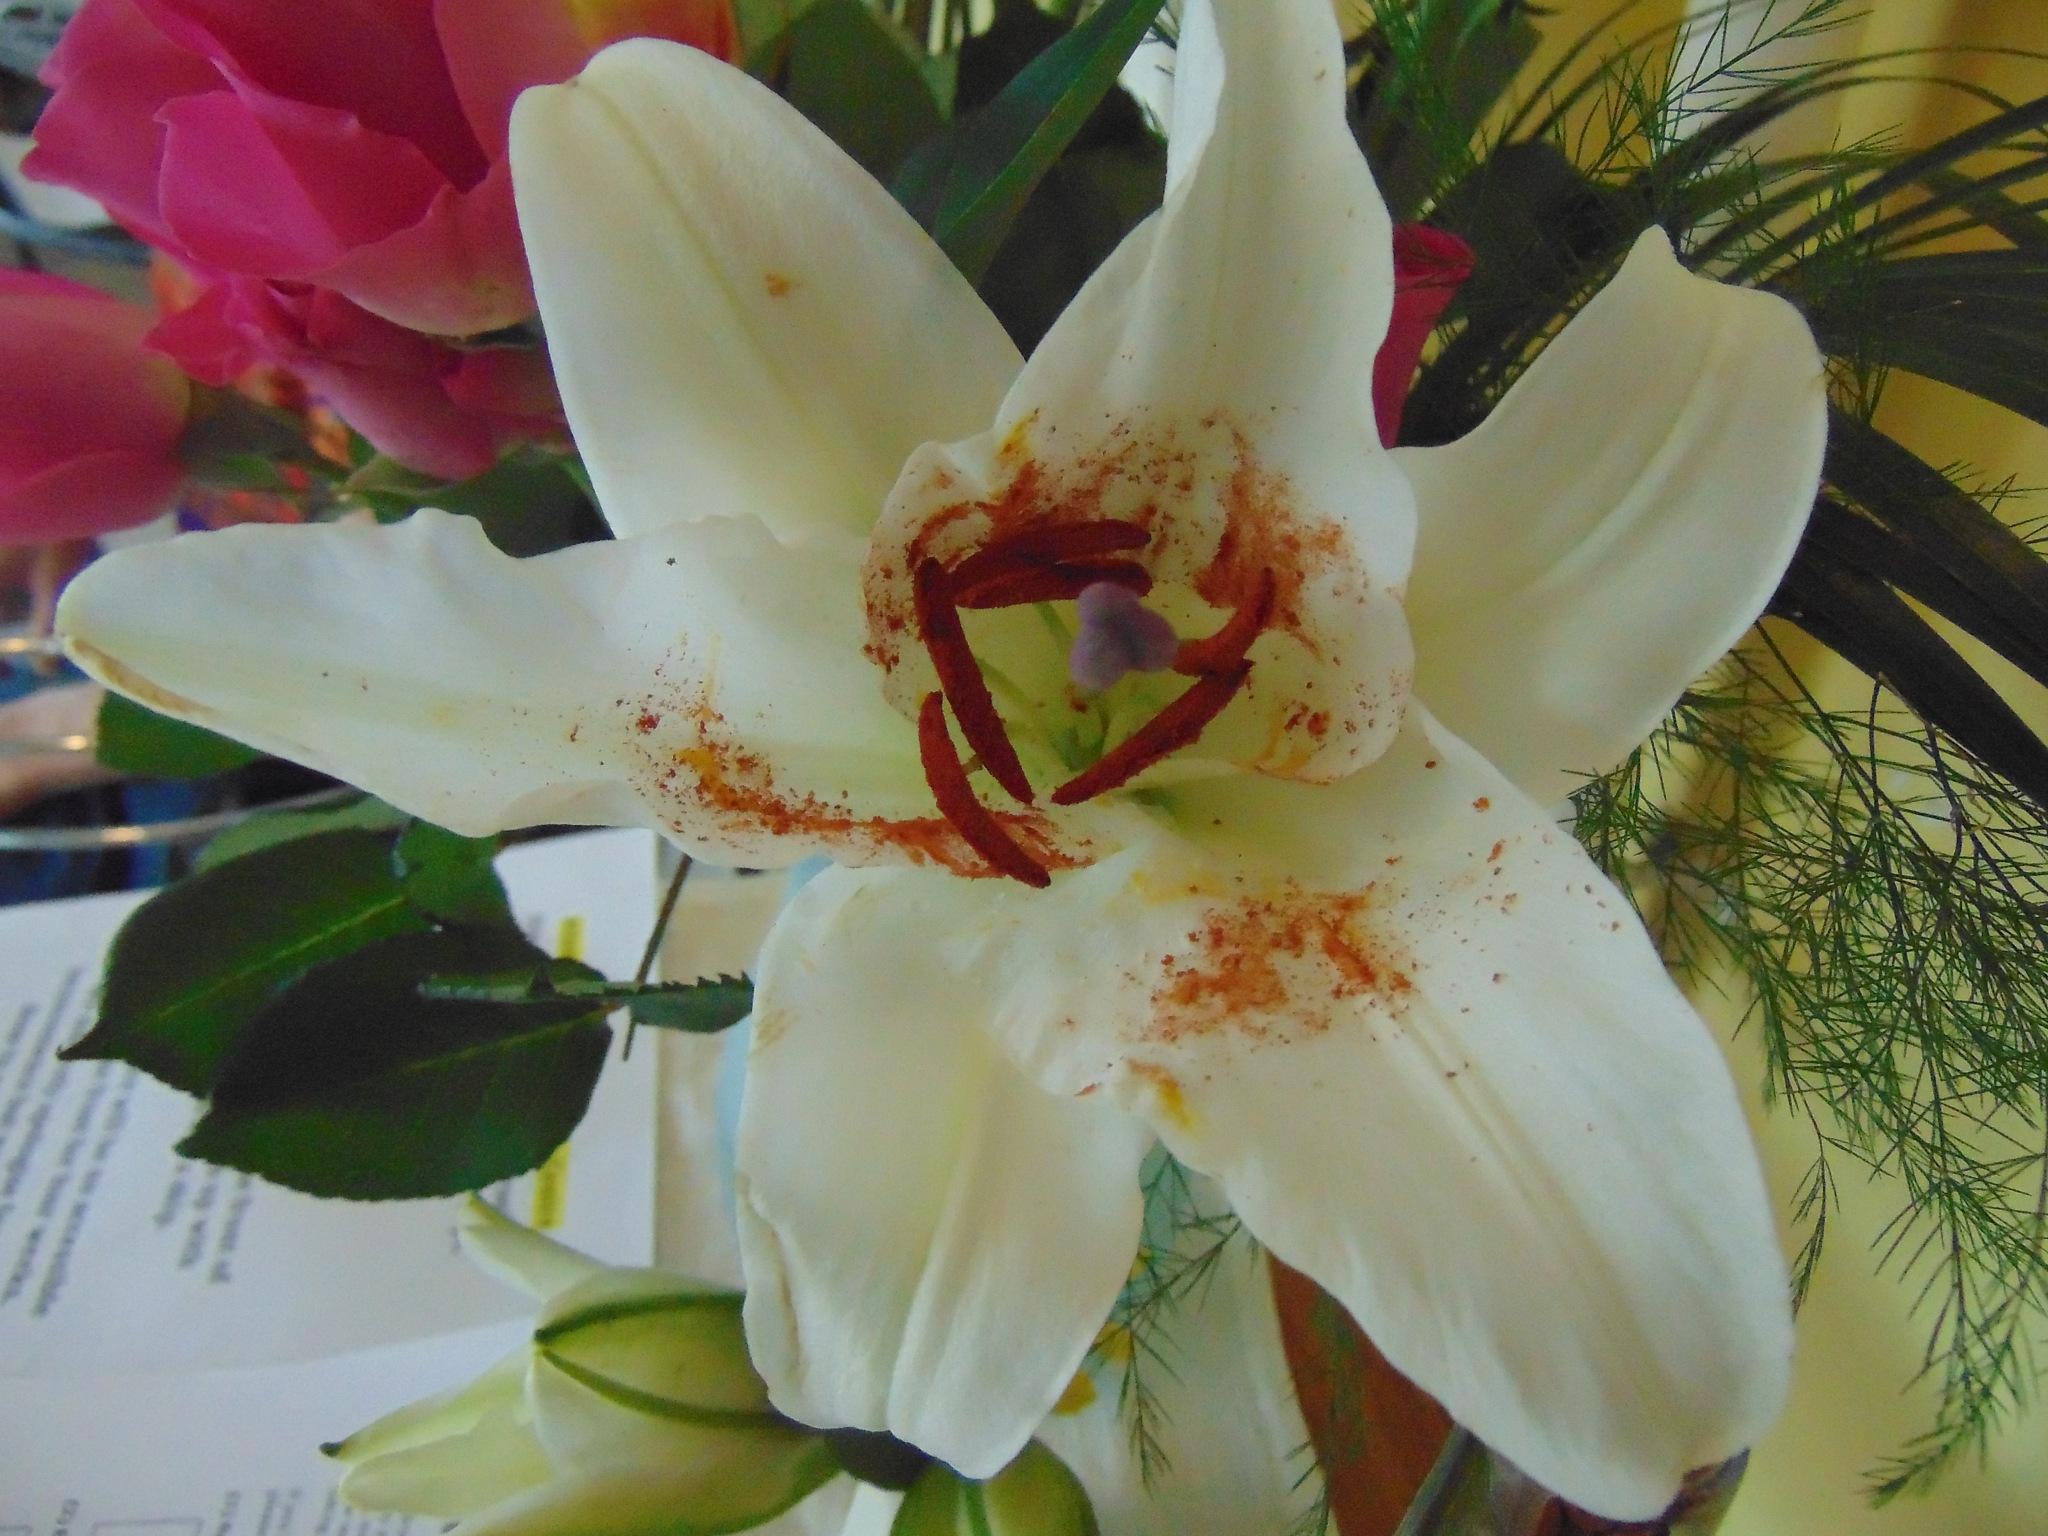 Lily by brian.f.kirkham